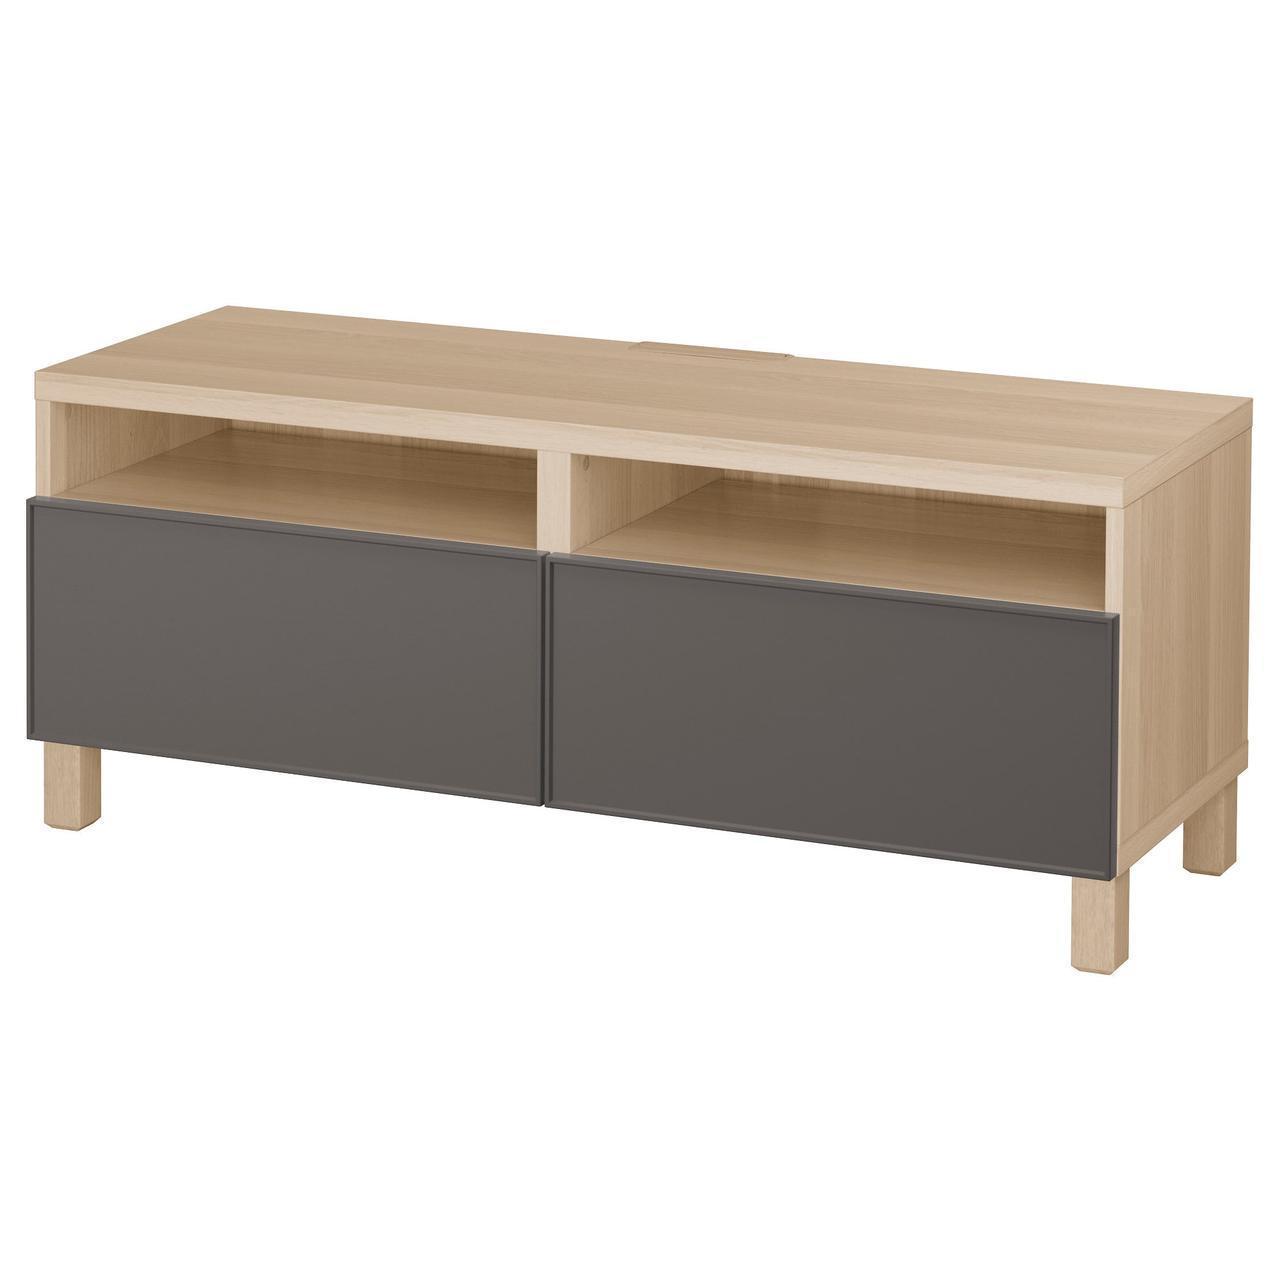 IKEA BESTA Тумба под телевизор с ящиками, белый дуб, Грундсвикен темно-серый  (592.008.70)